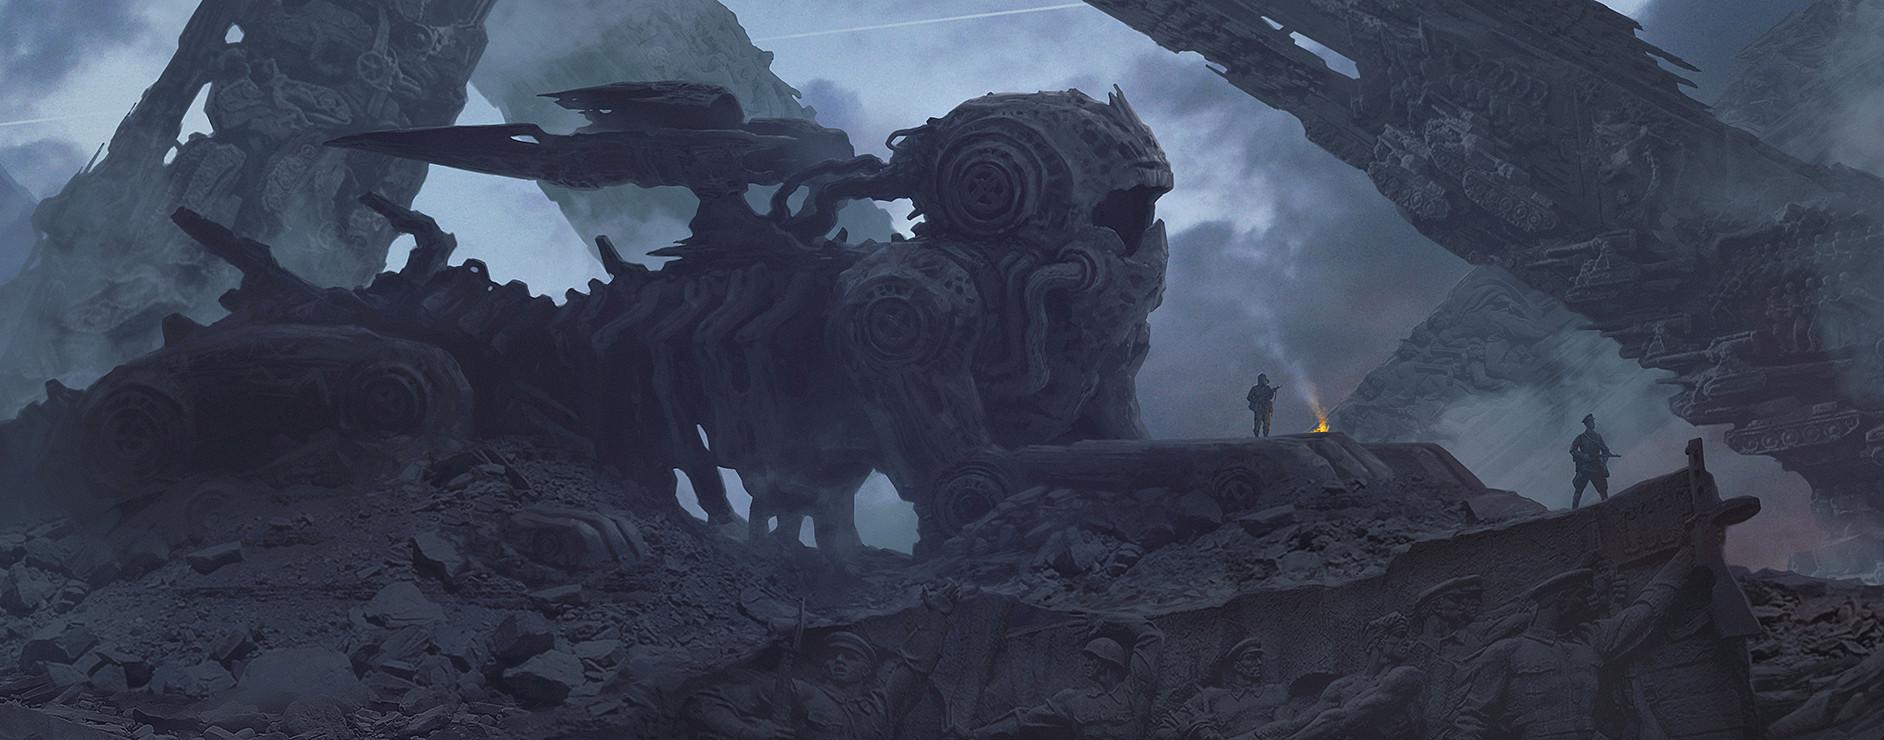 Alexey egorov battle sphinx